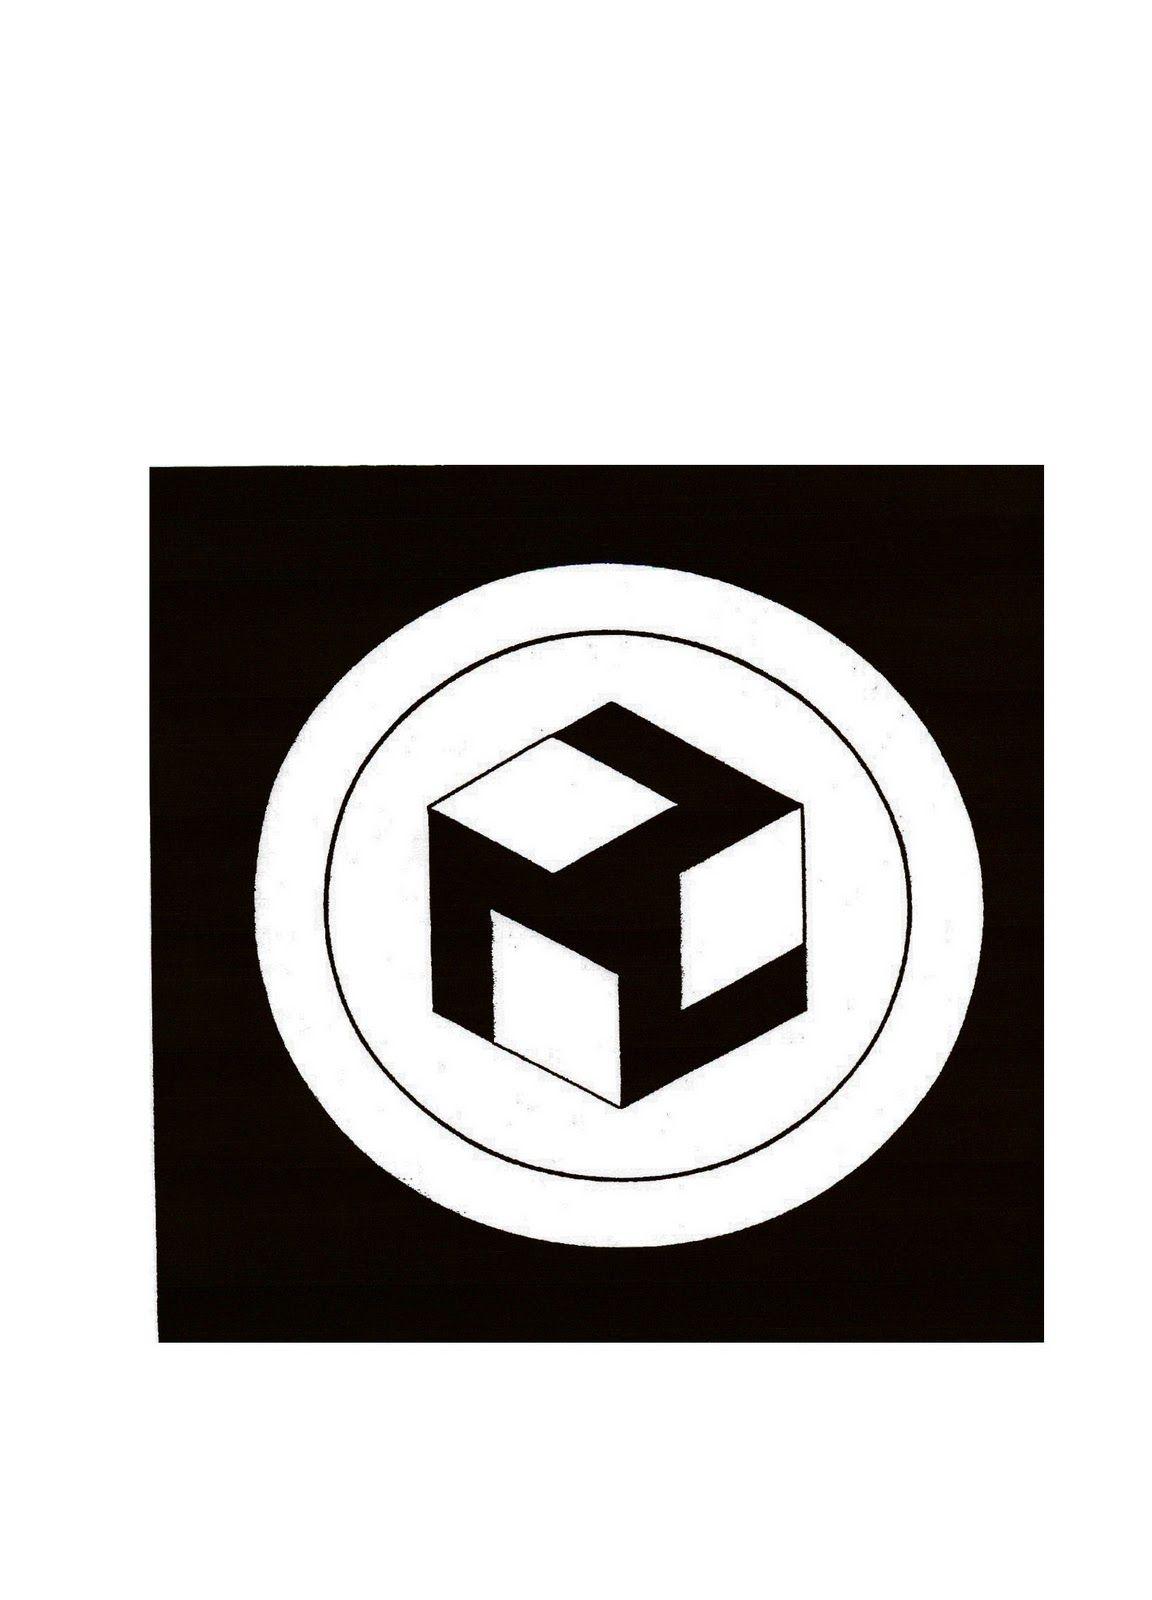 Powerful Ancient Symbols This Is The Small Single Antahkarana Male